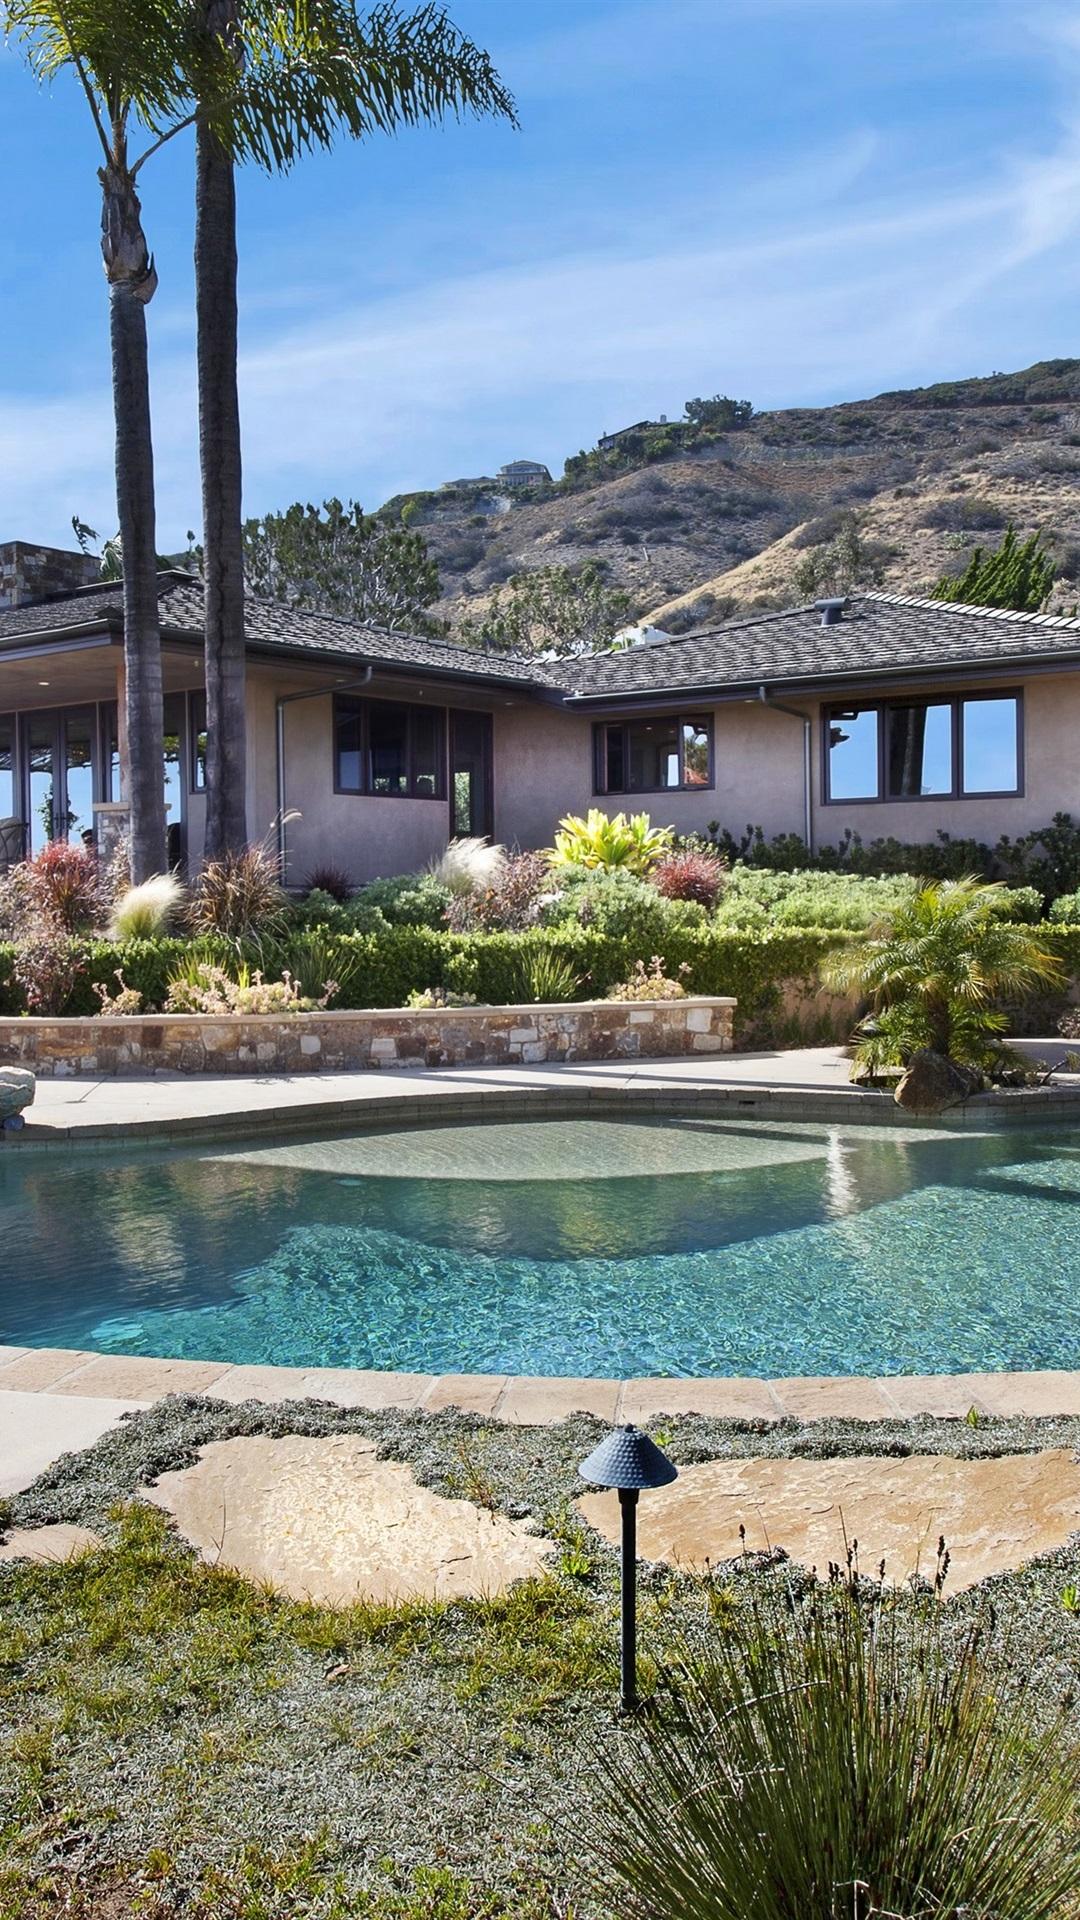 Wallpaper Laguna Beach House Palm Trees Pool Usa 3840x2160 Uhd 4k Picture Image